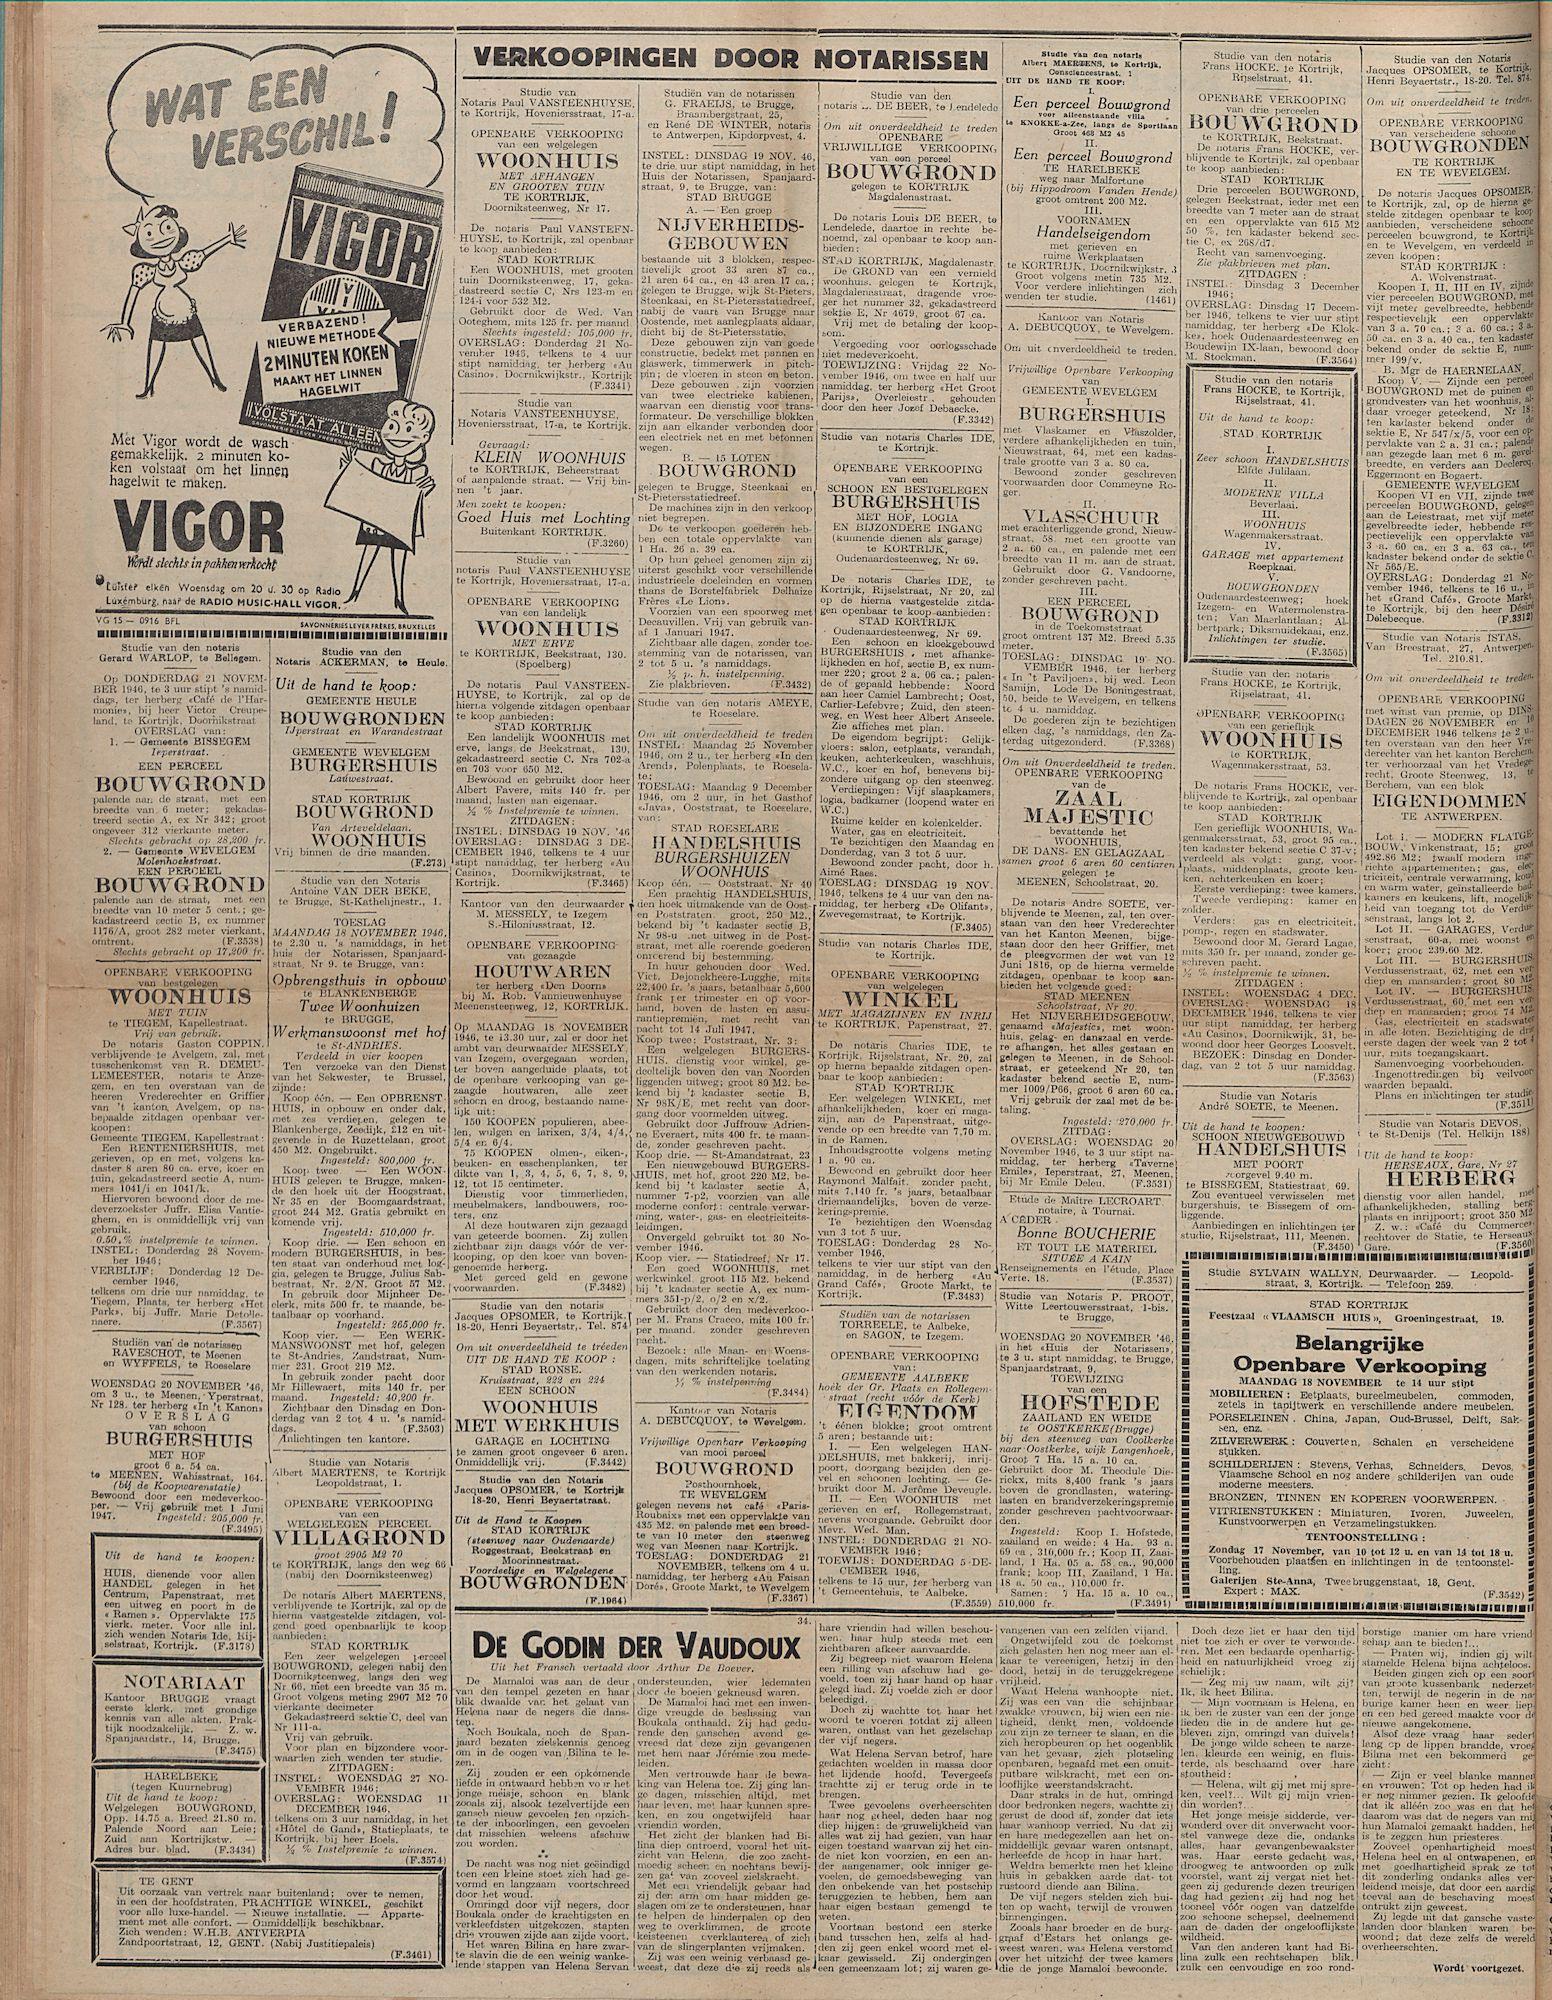 Kortrijksch Handelsblad 15 november 1946 N92 p4